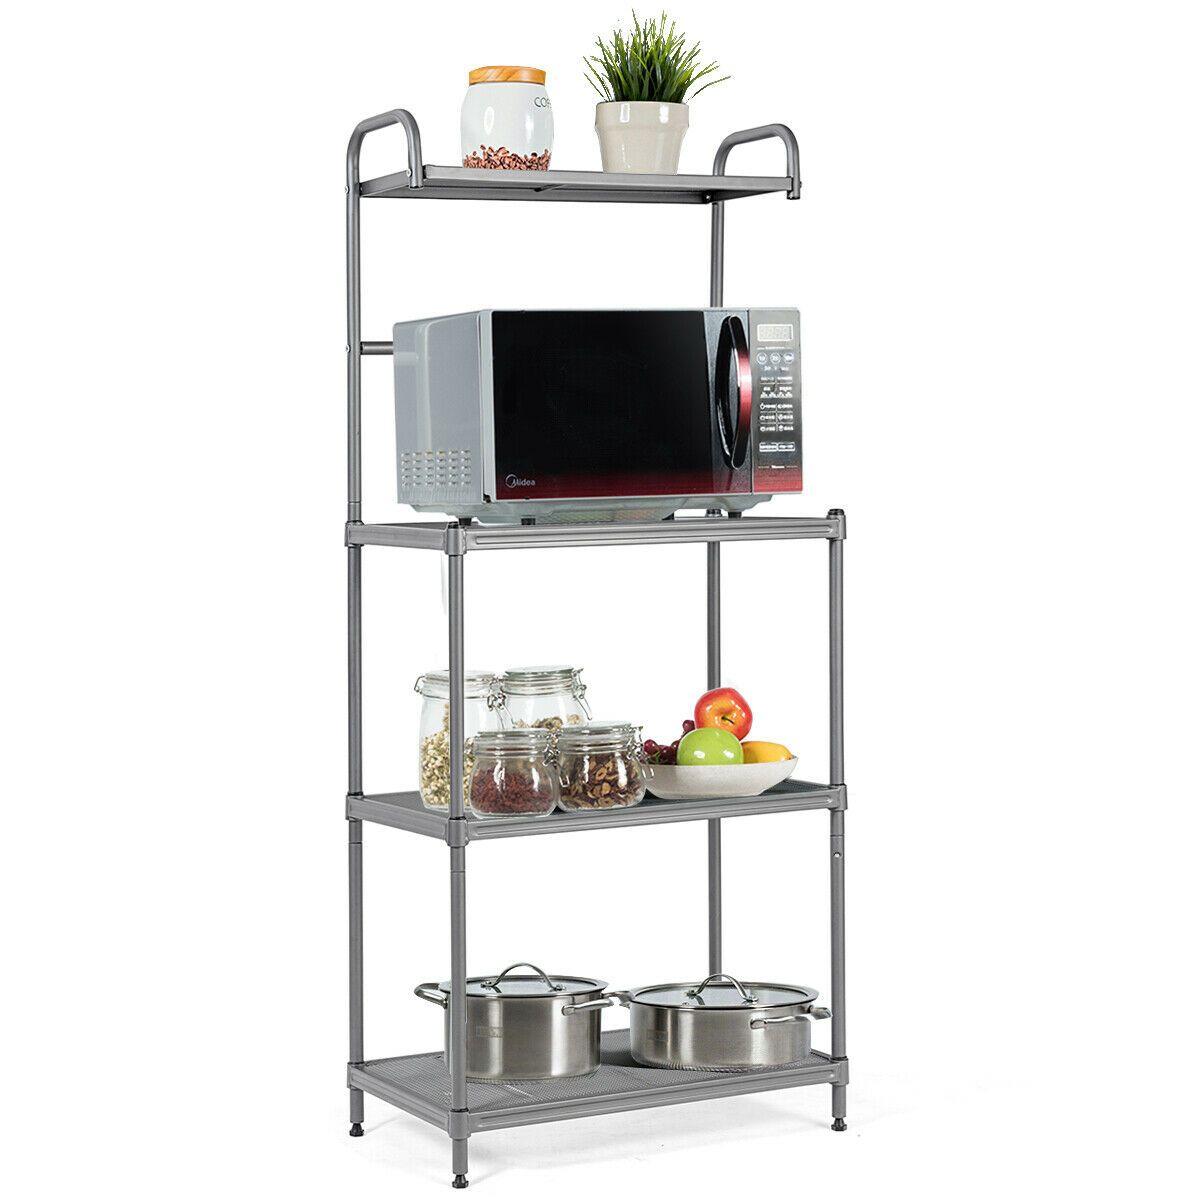 4 Layer Kitchen Microwave Oven Stand Rack Baker Shelf Organize Storage